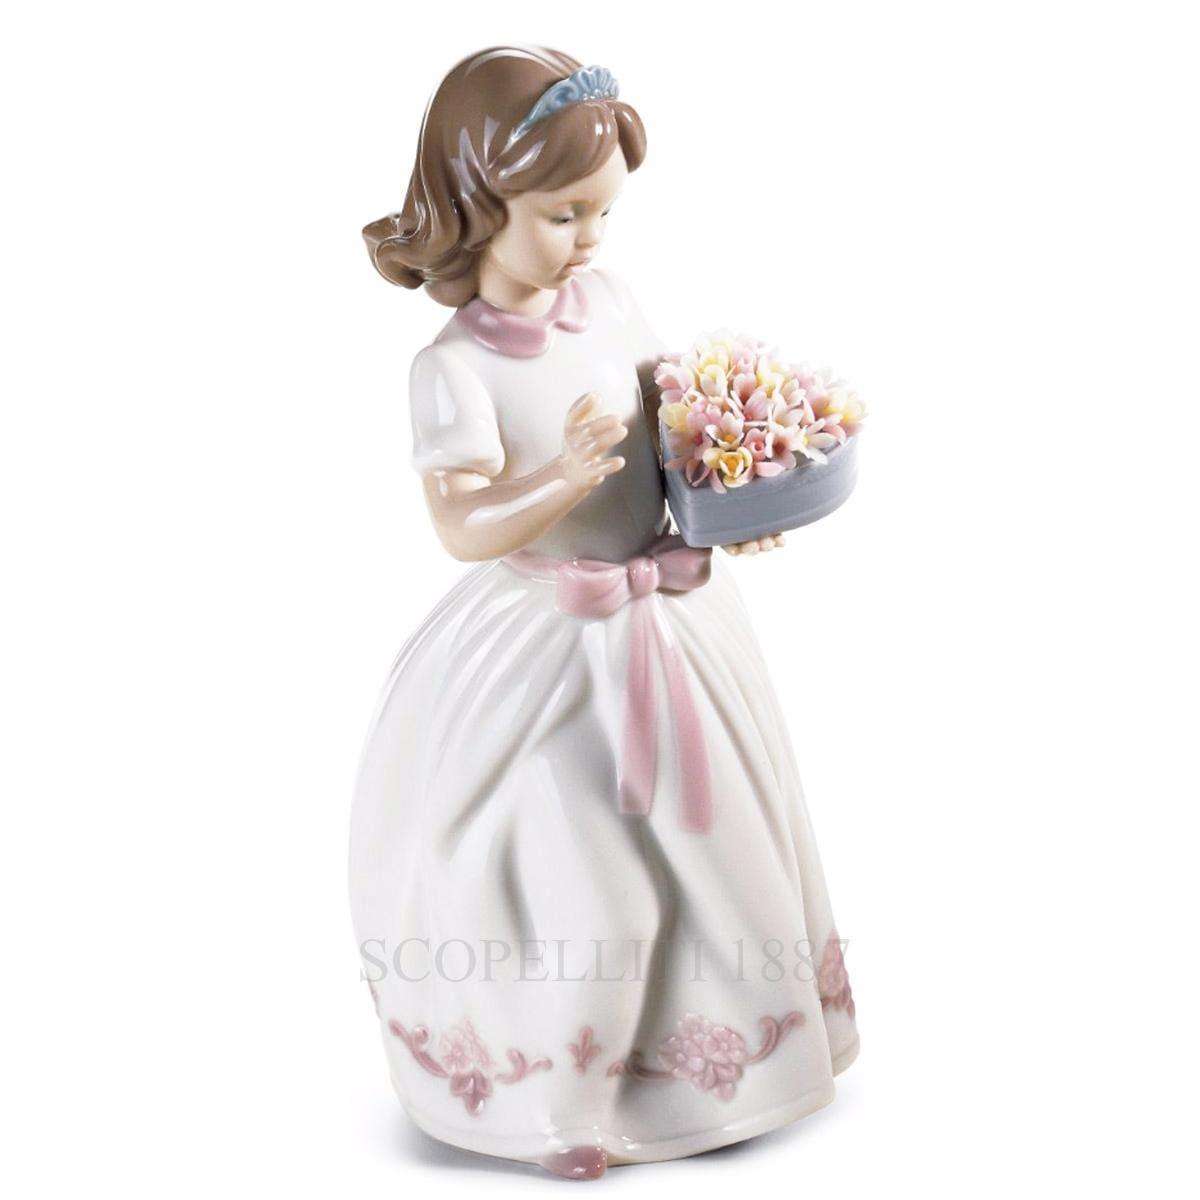 lladro special someone porcelain figurine spanish designer